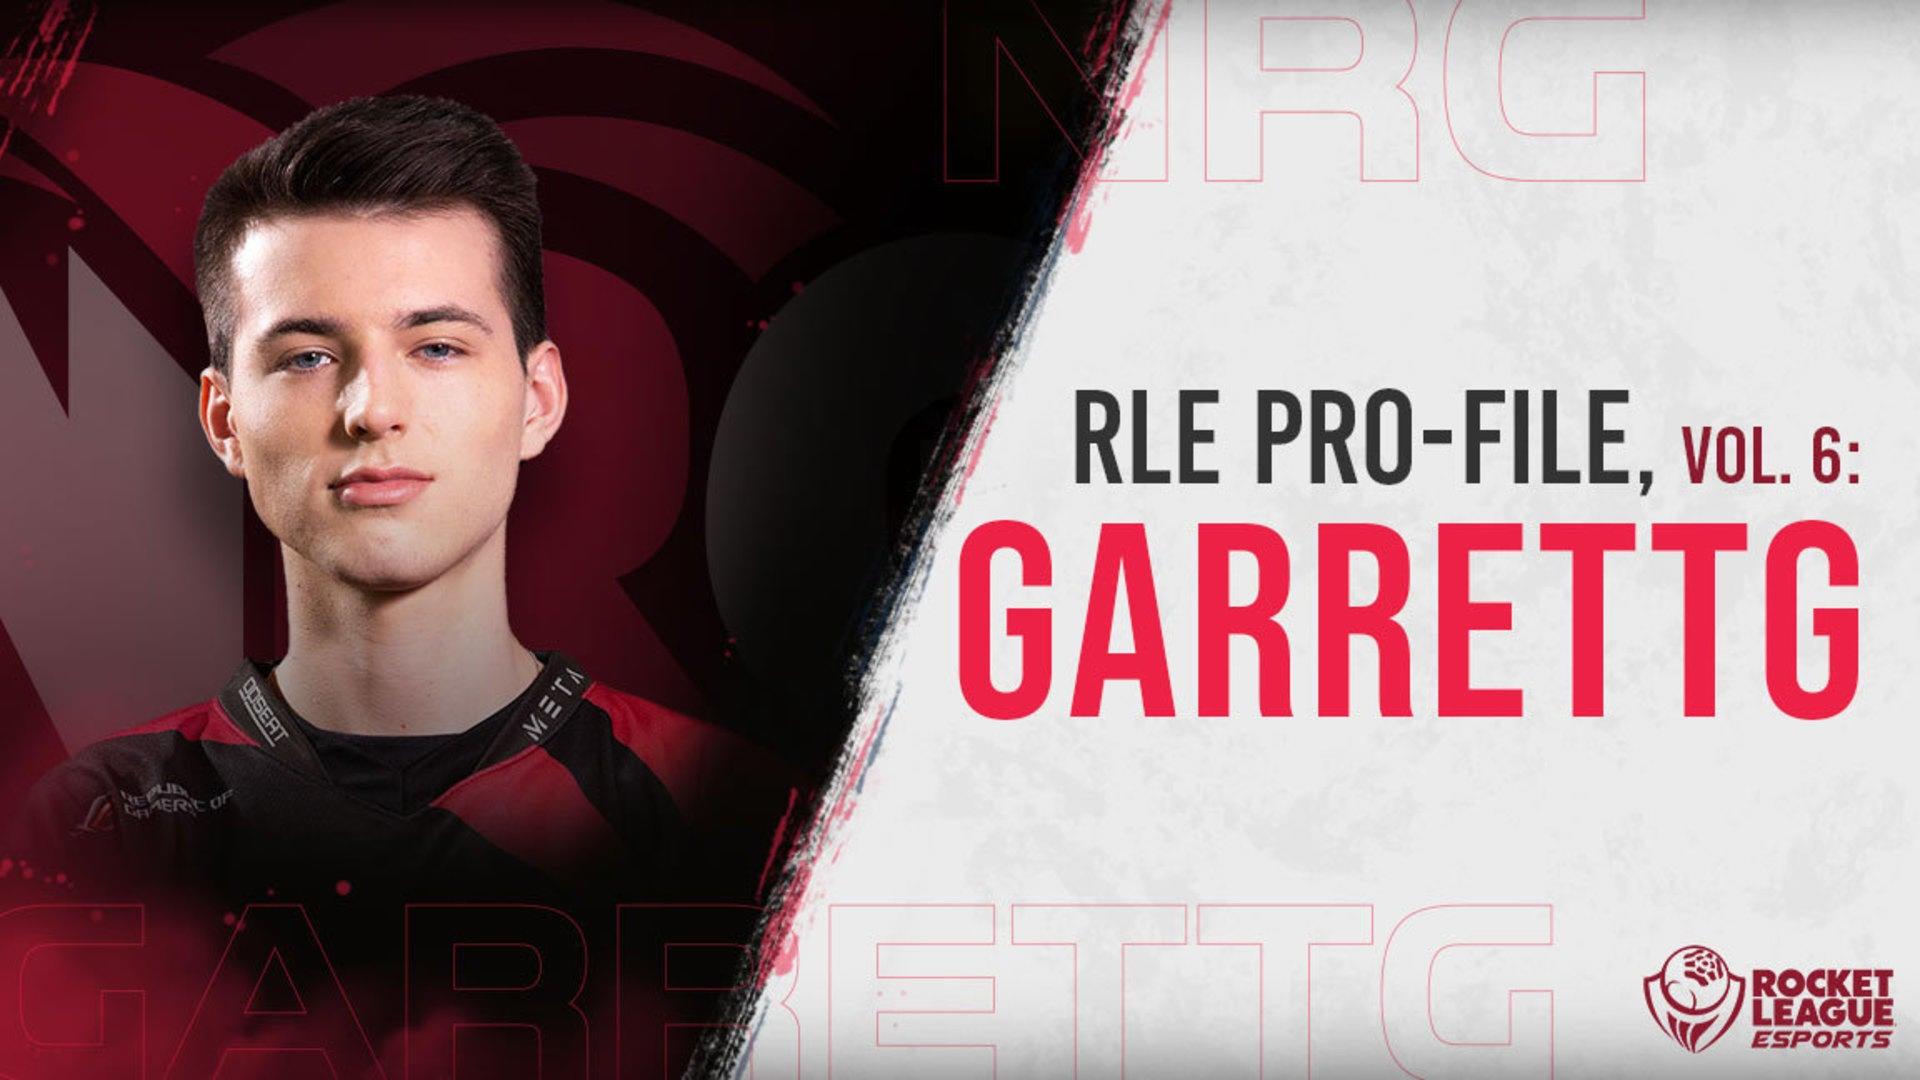 RLE PRO-File, Vol. 6: GarrettG Image